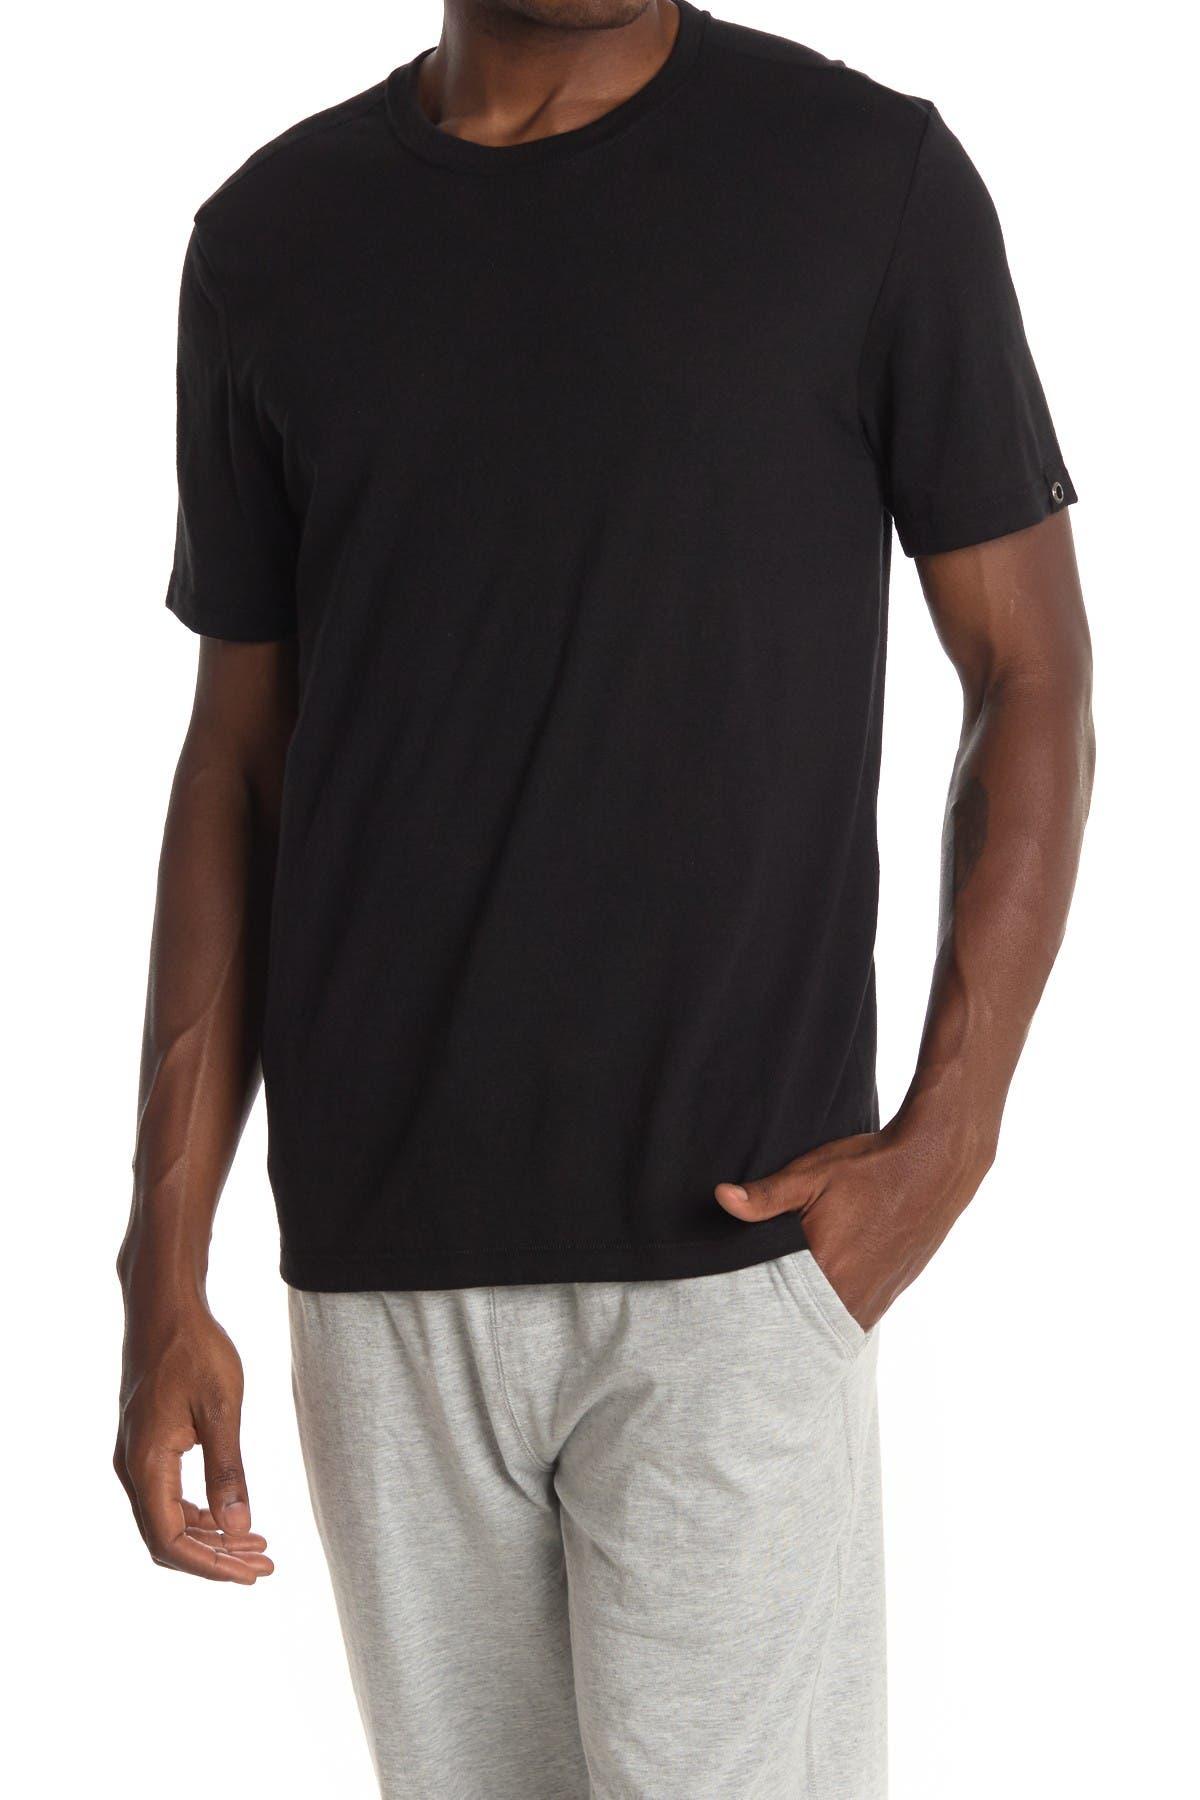 Image of Tommy Hilfiger Crew Neck Lounge T-Shirt